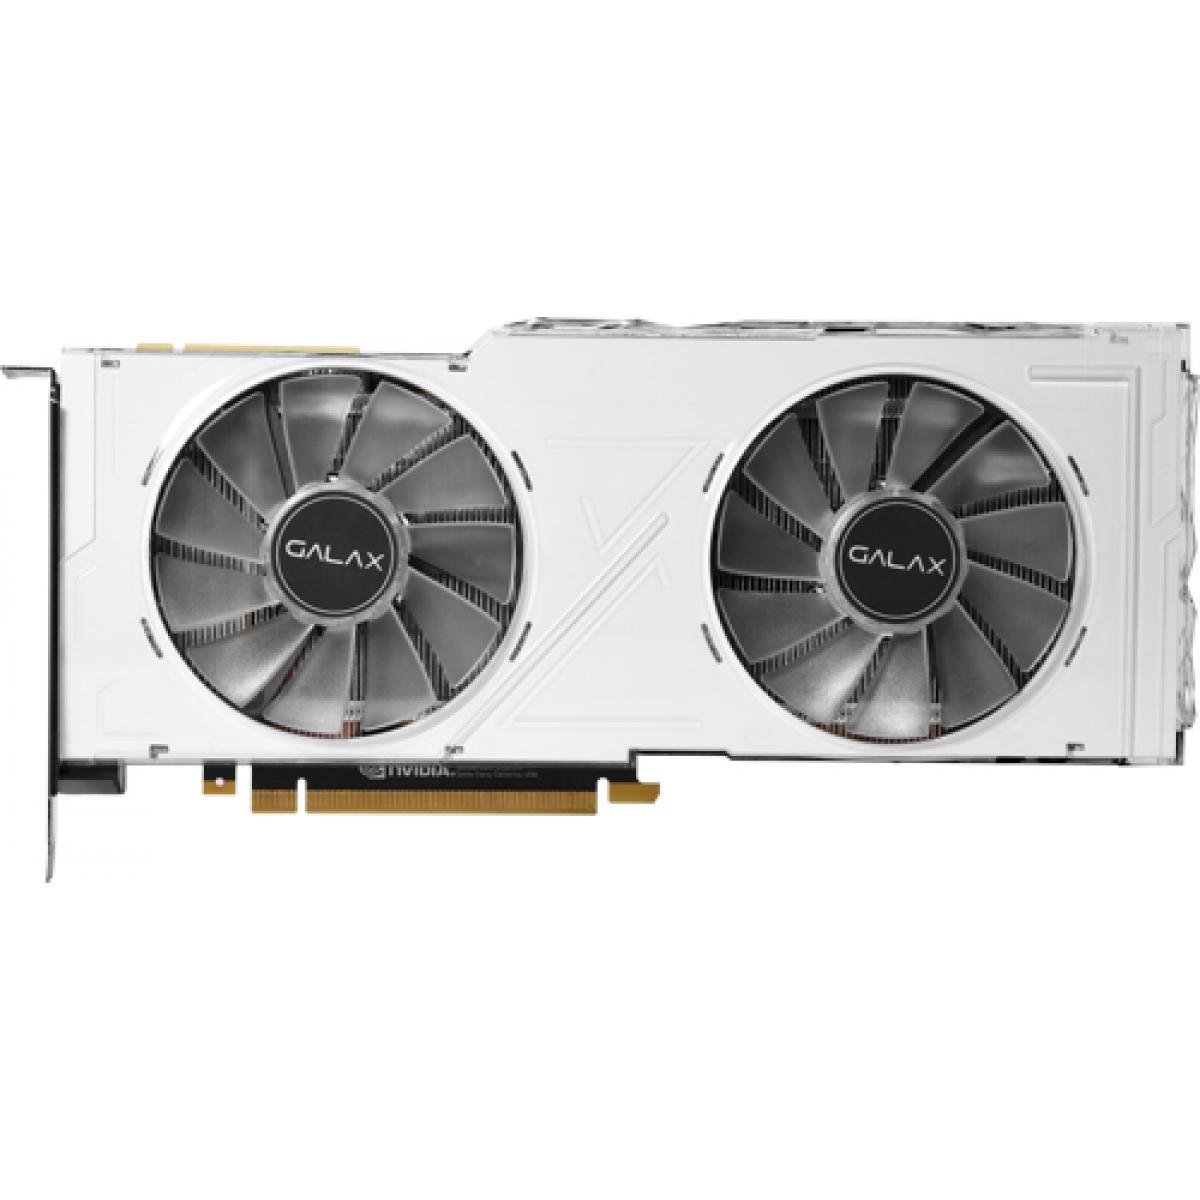 Placa de Vídeo Galax Geforce RTX 2080 Ti White (1-Click OC) Dual, 11GB GDDR6, 352Bit, 28IULBUCT4KW